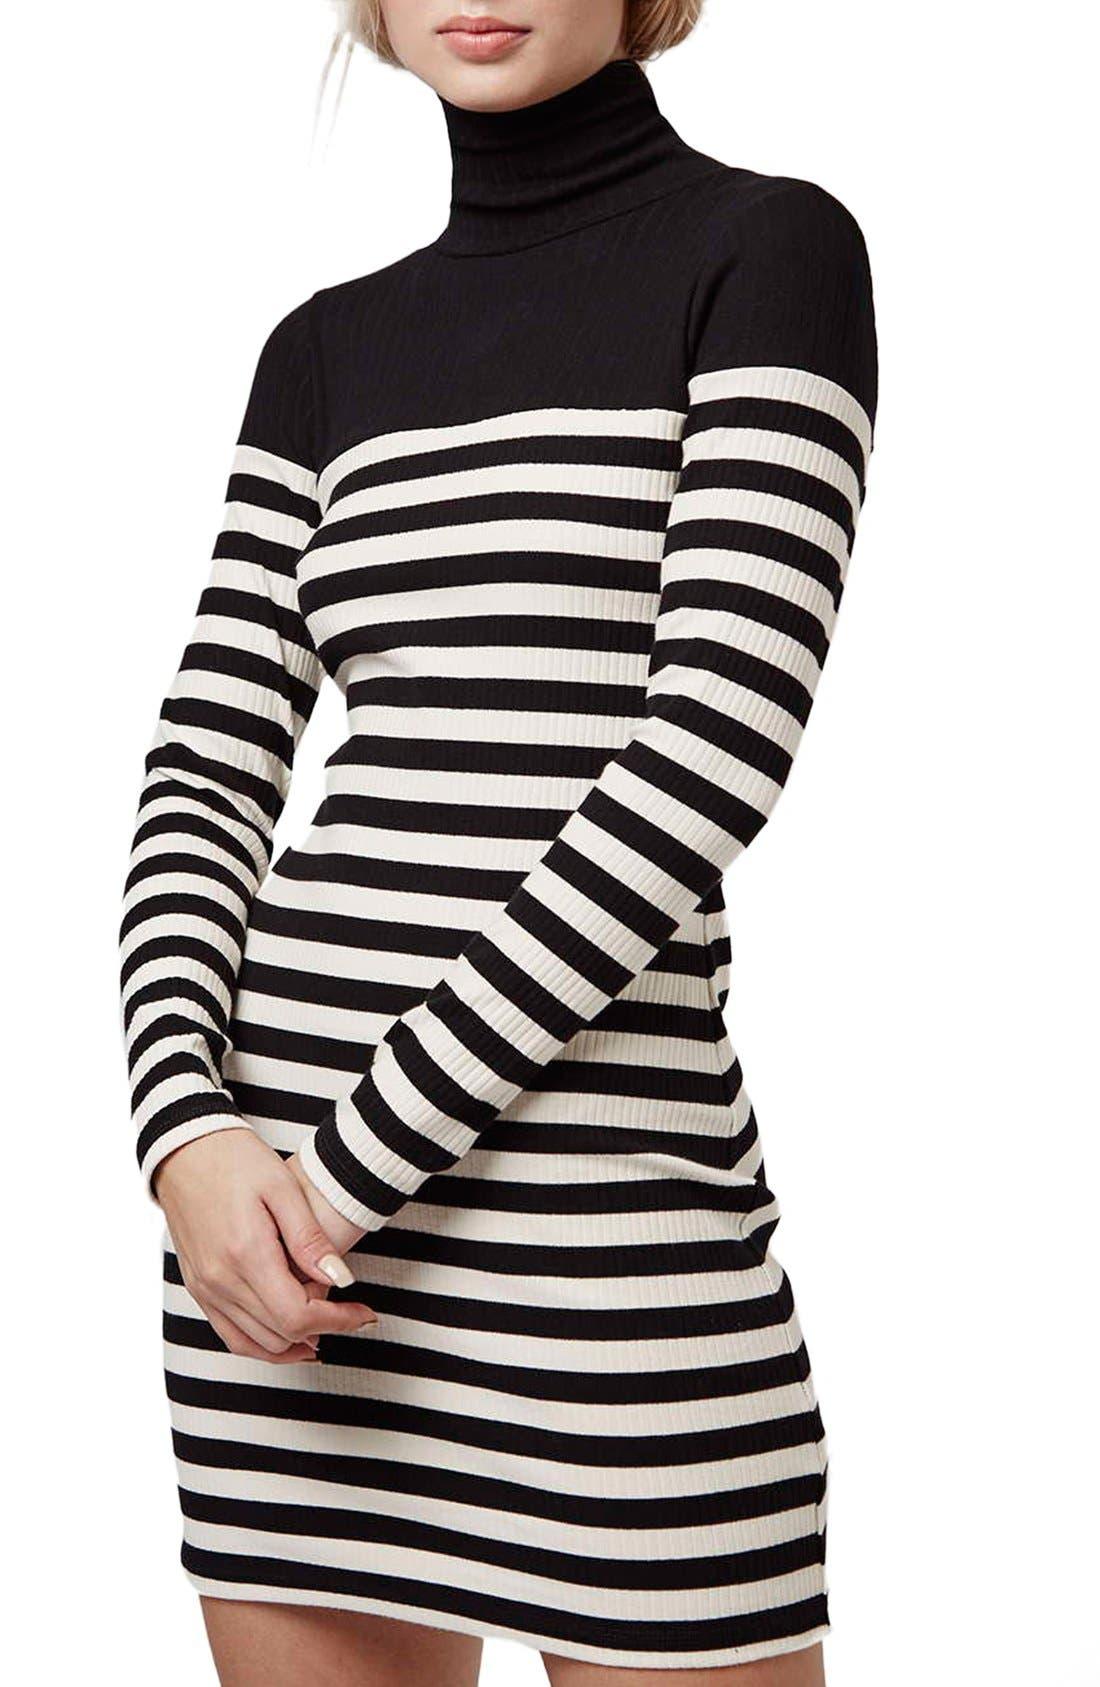 Alternate Image 1 Selected - Topshop Turtleneck Long Sleeve Body-Con Dress (Petite)